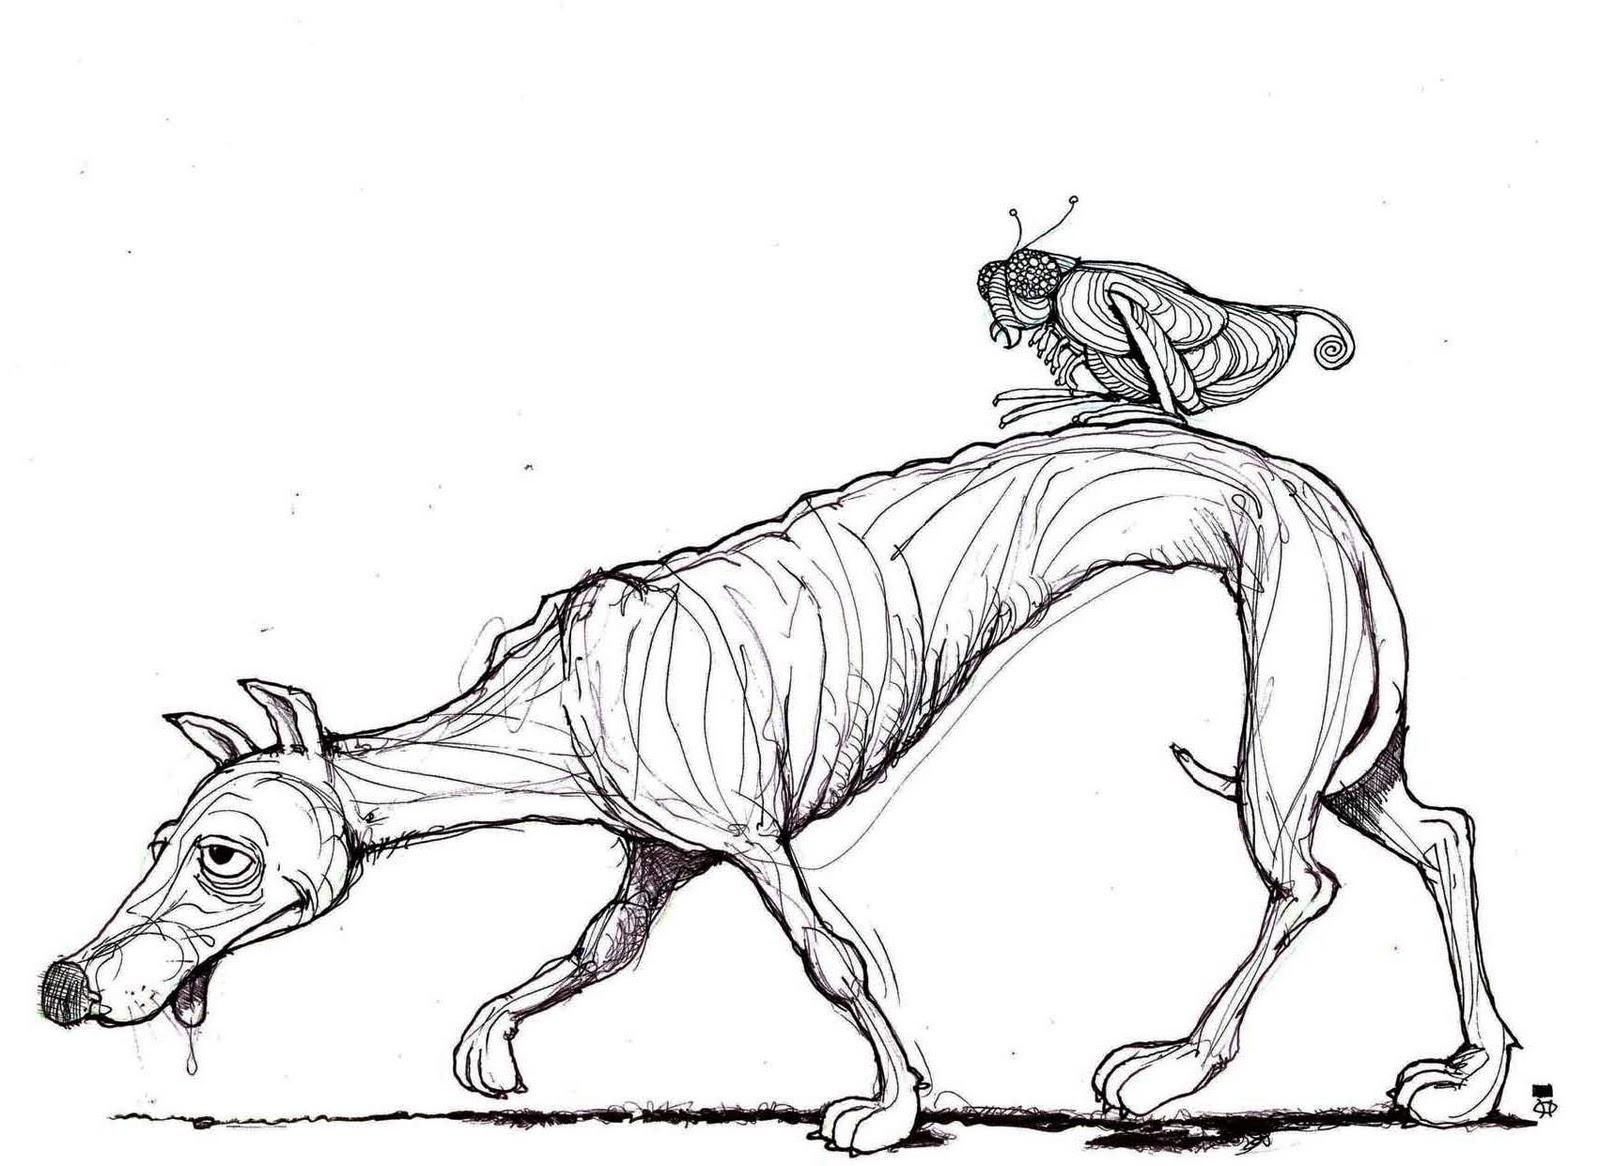 Refranero antiguo Perro flaco